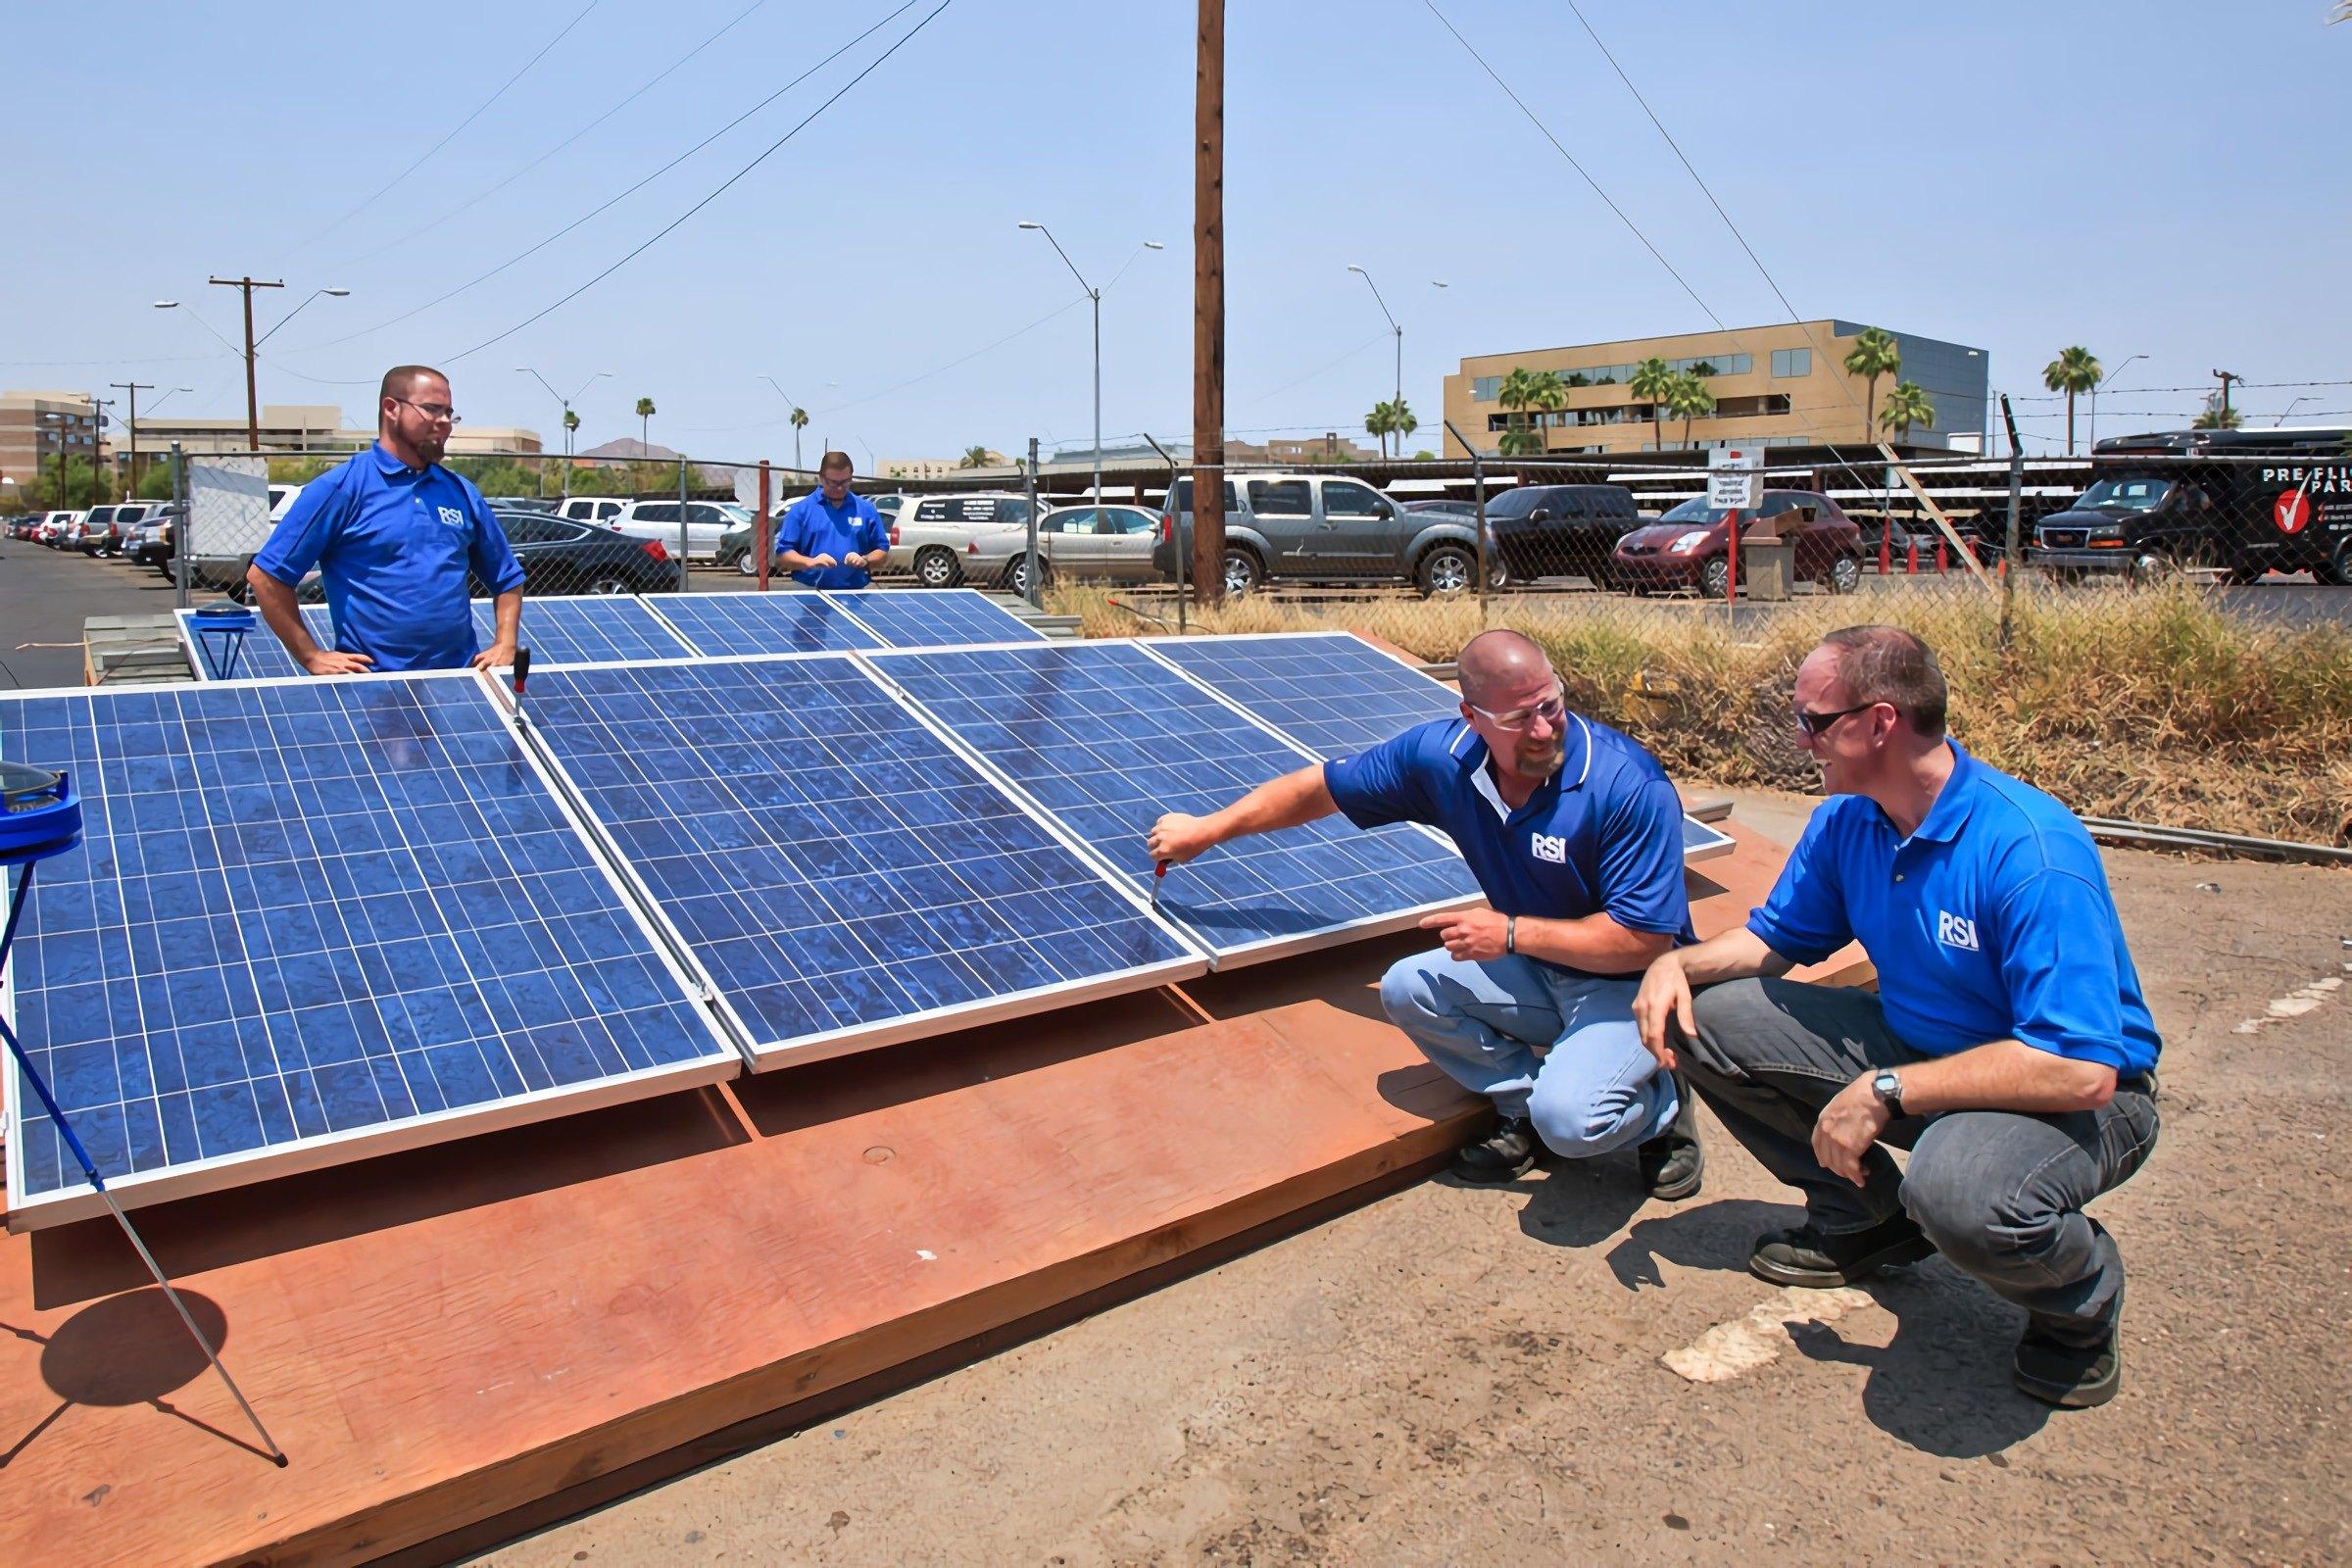 RSI Refrigeration School Training Phoenix Equipment Solar